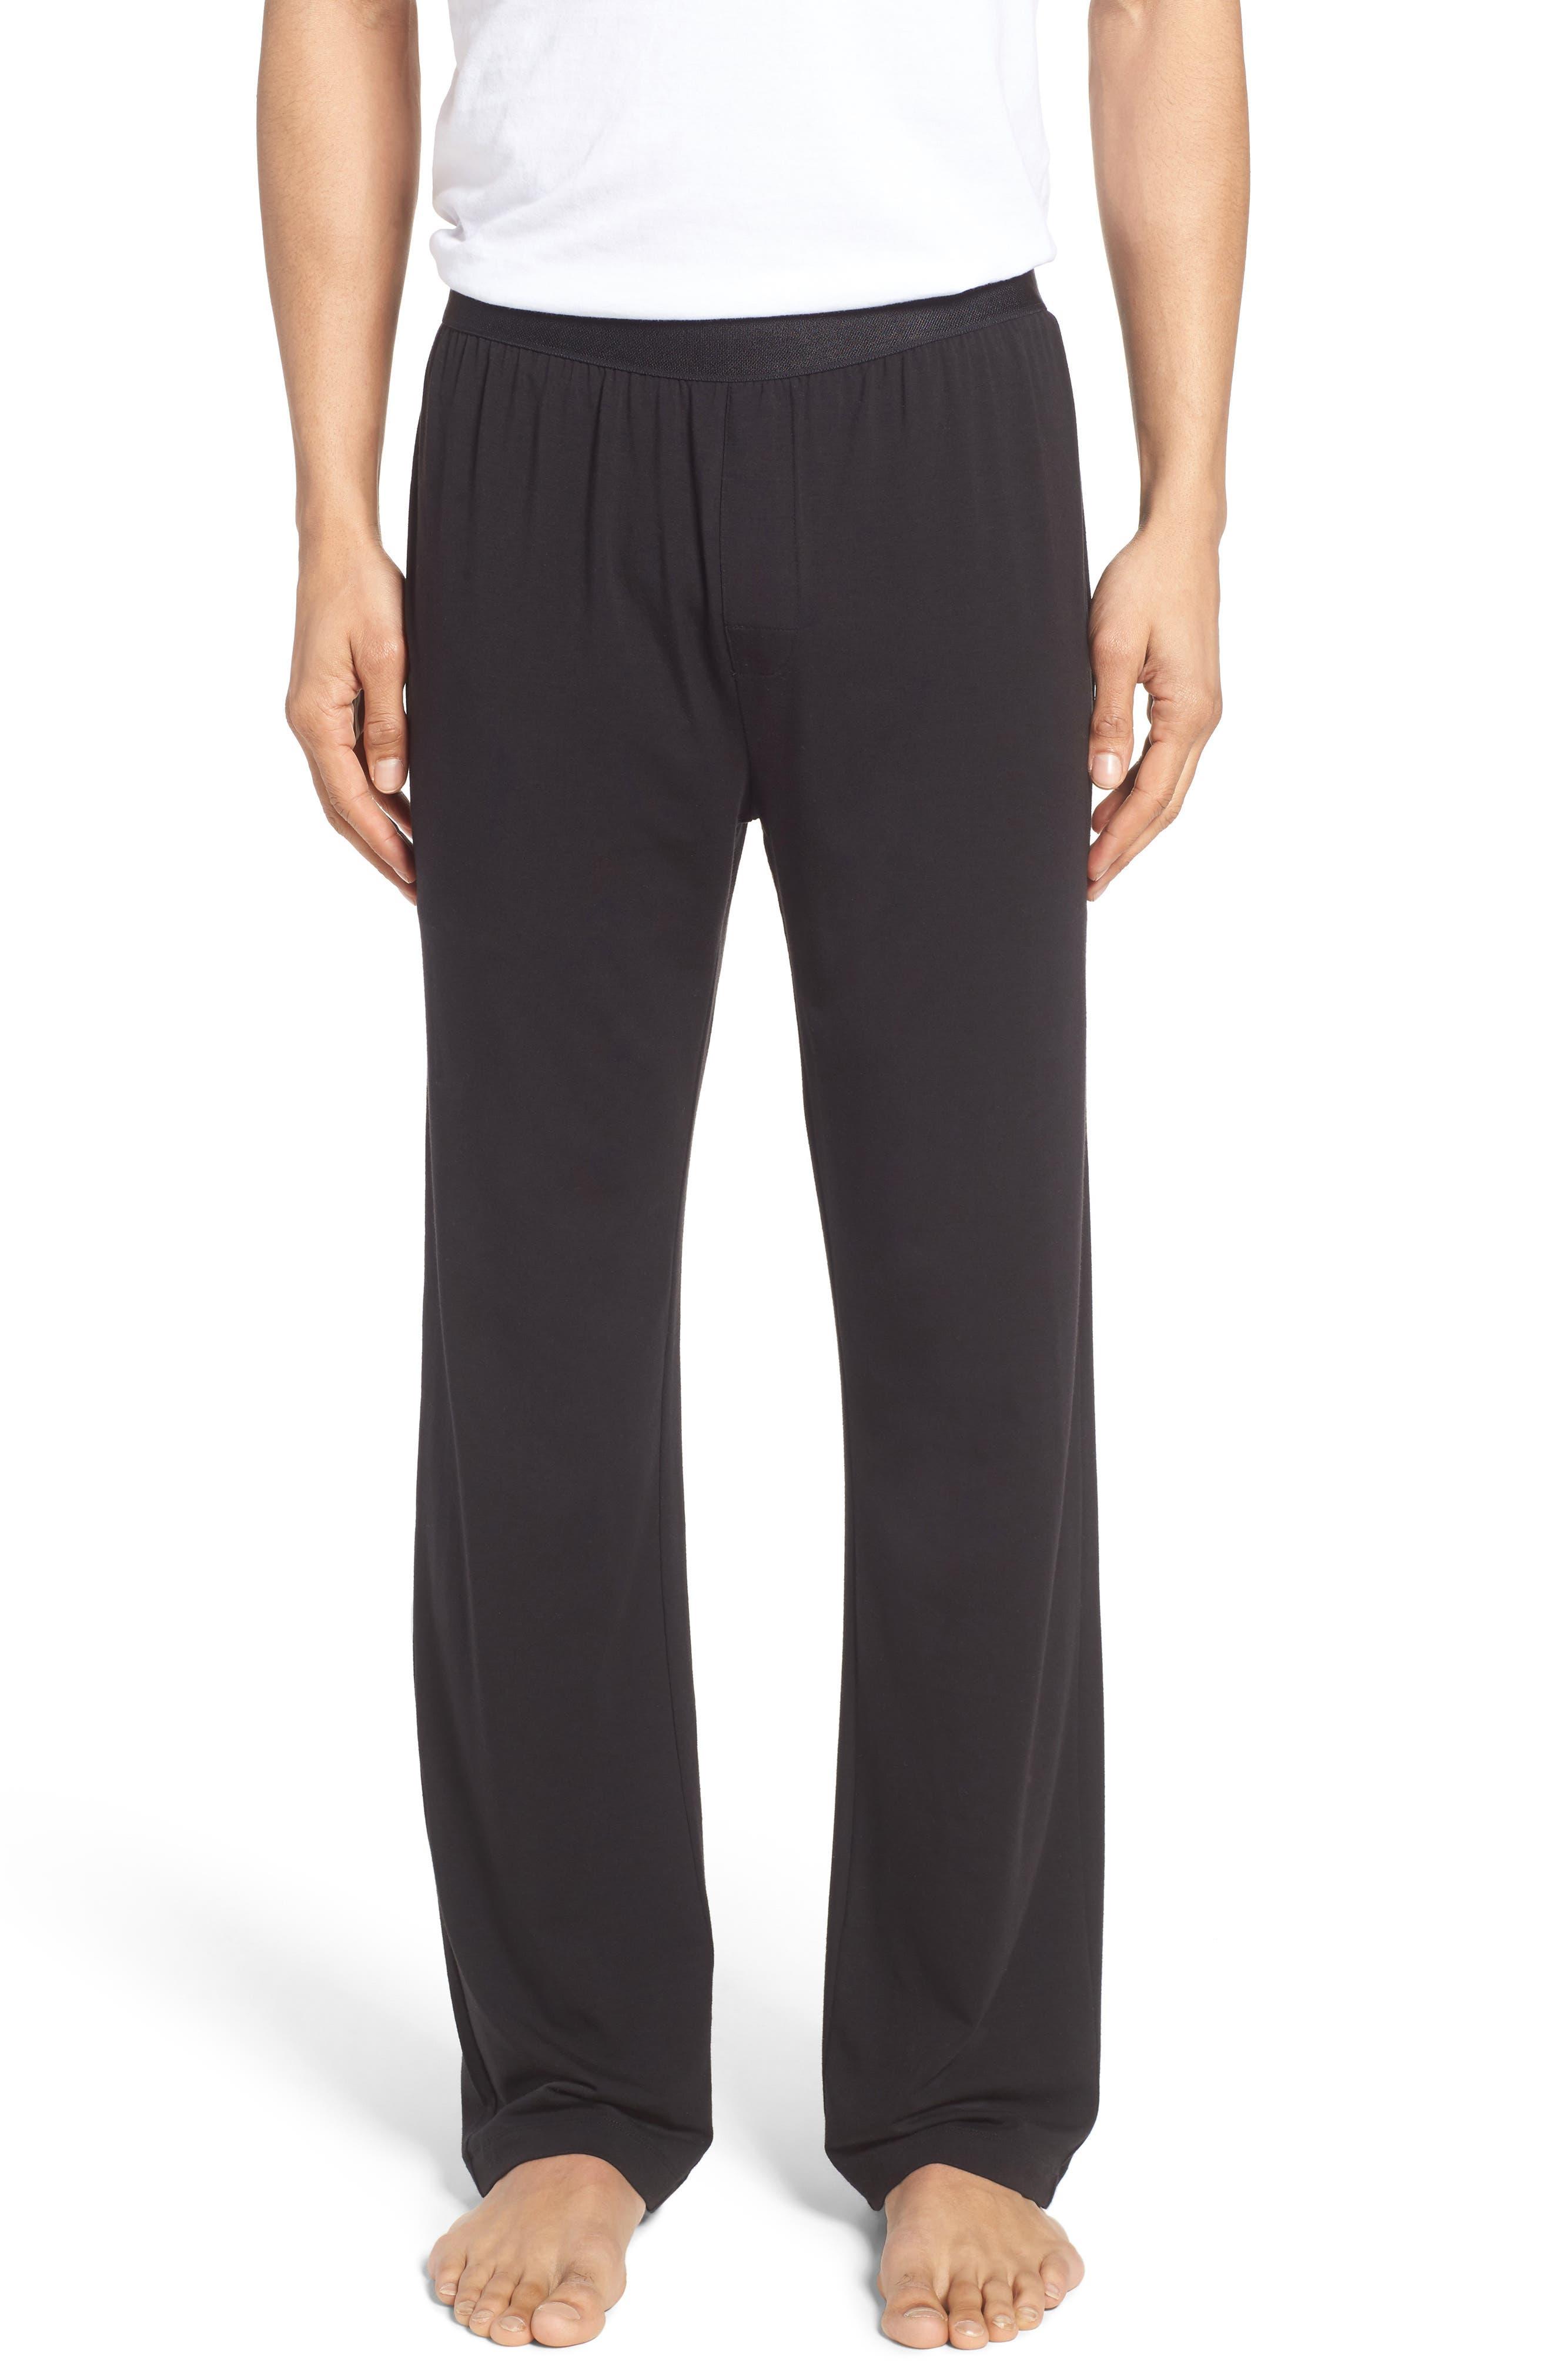 Micromodal Blend Lounge Pants,                         Main,                         color, Black